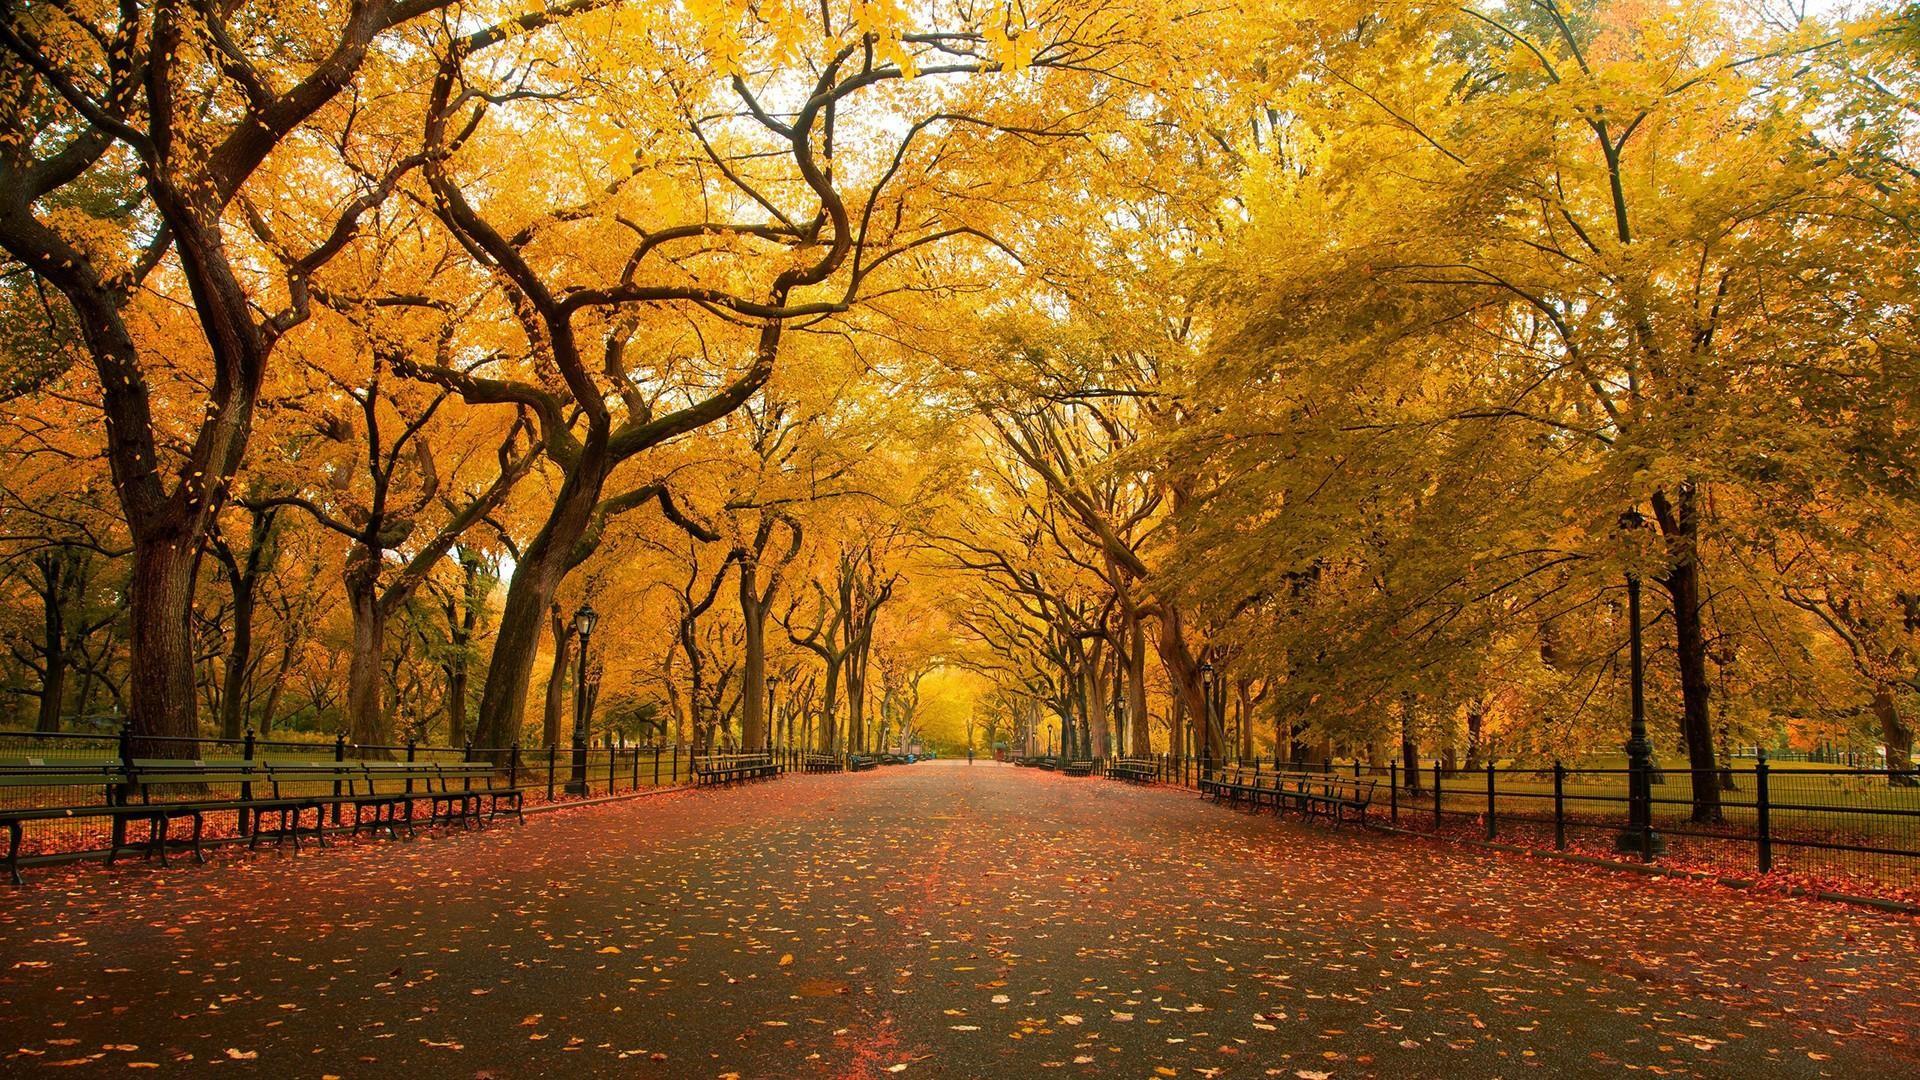 Yellow Orange Autumn Foliage HD Wide Wallpaper for Widescreen (50 Wallpapers)  – HD Wallpapers